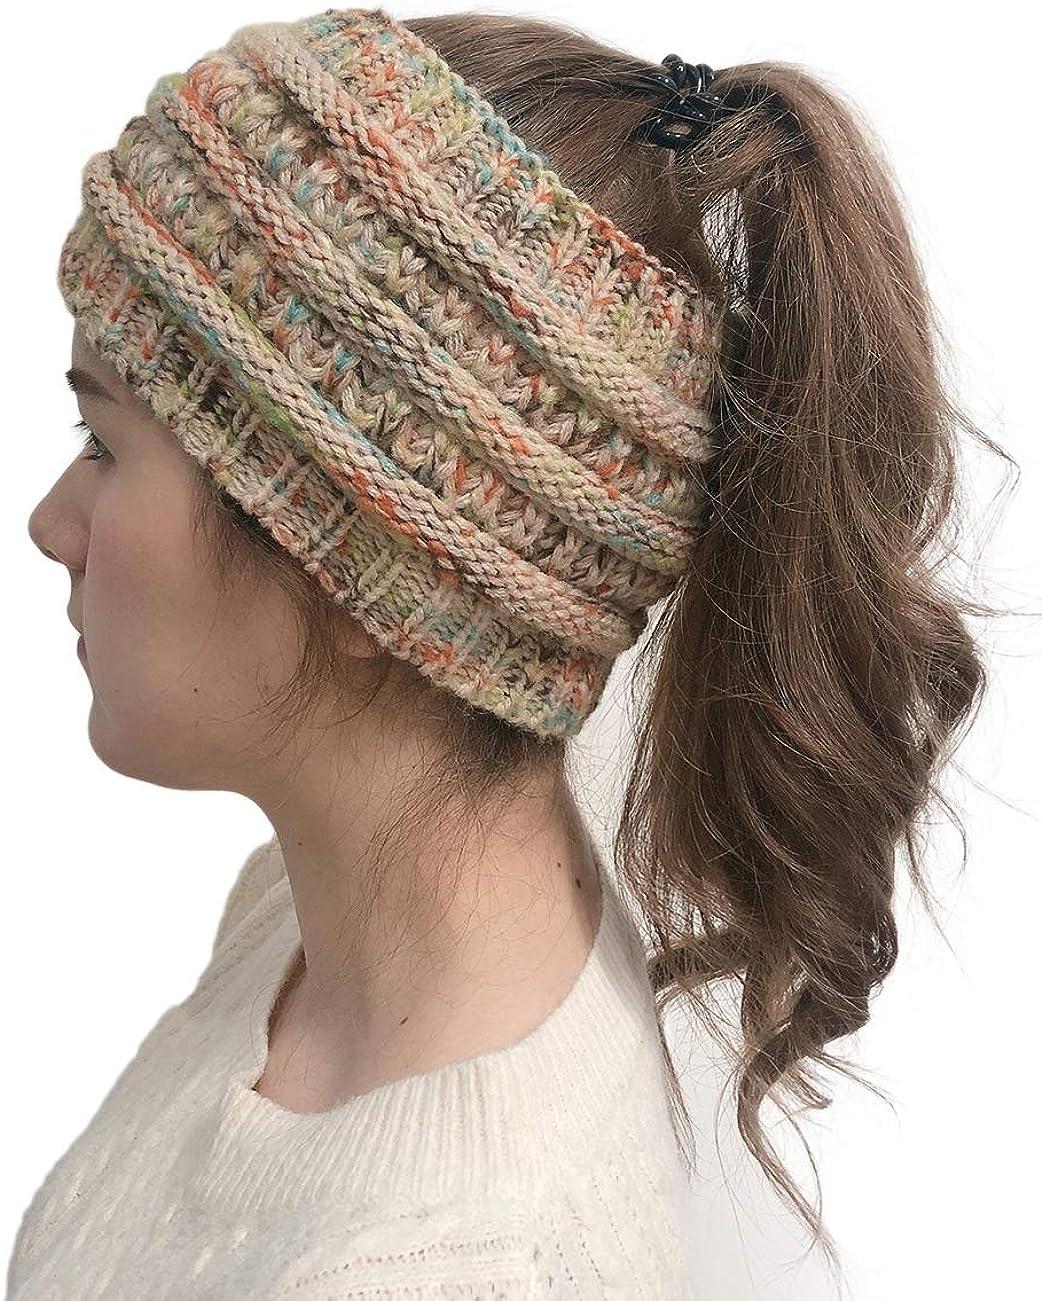 Knit half Winter Headband Warm security Cable Headban Crochet Wrap Turban Head